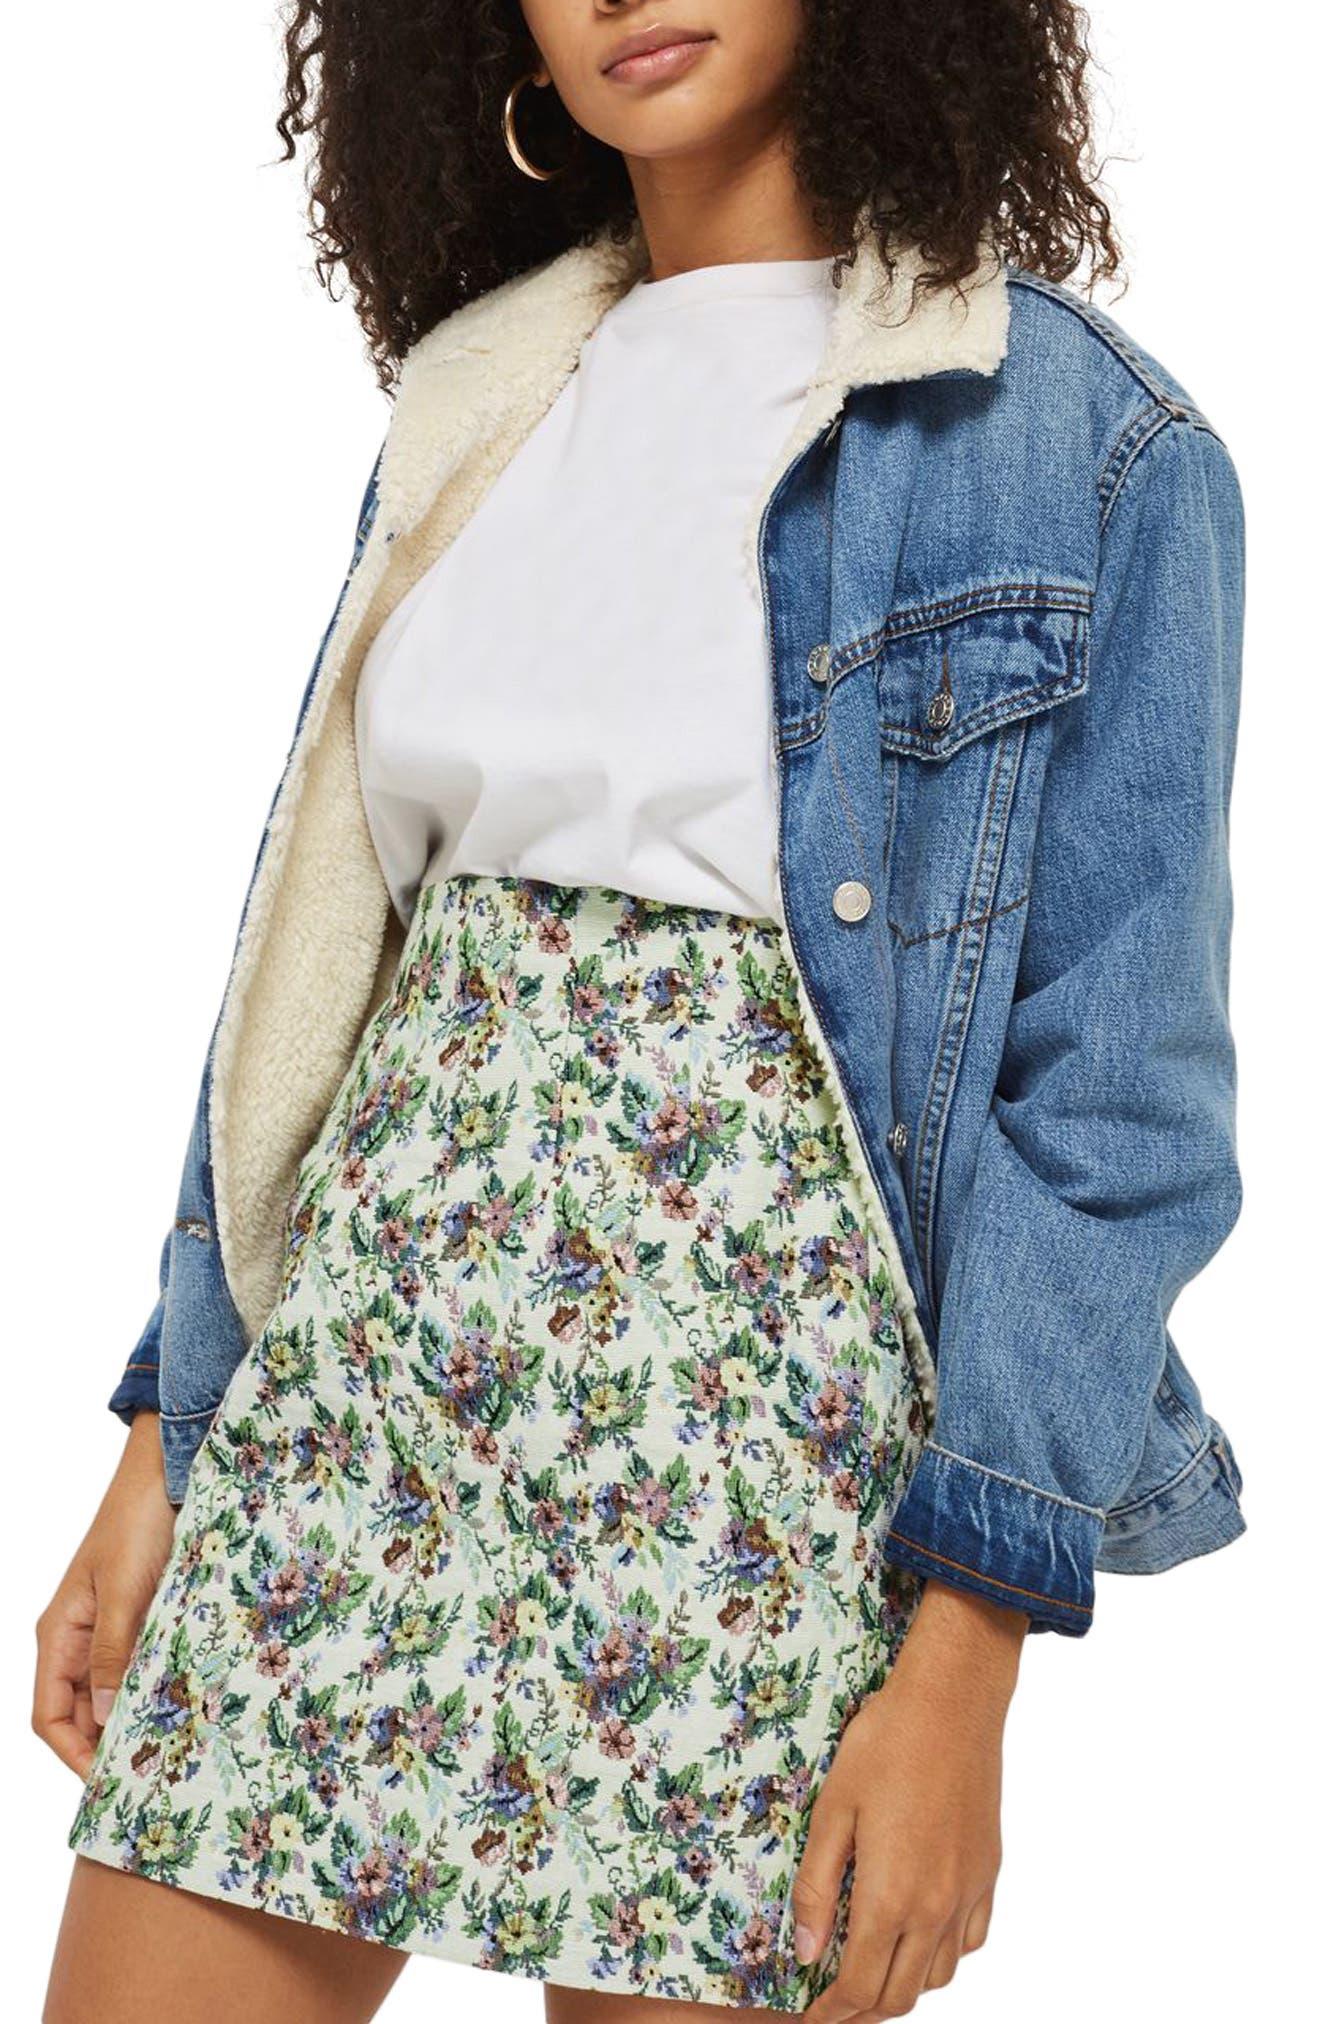 Alternate Image 1 Selected - Topshop Floral Jacquard High Waist Skirt